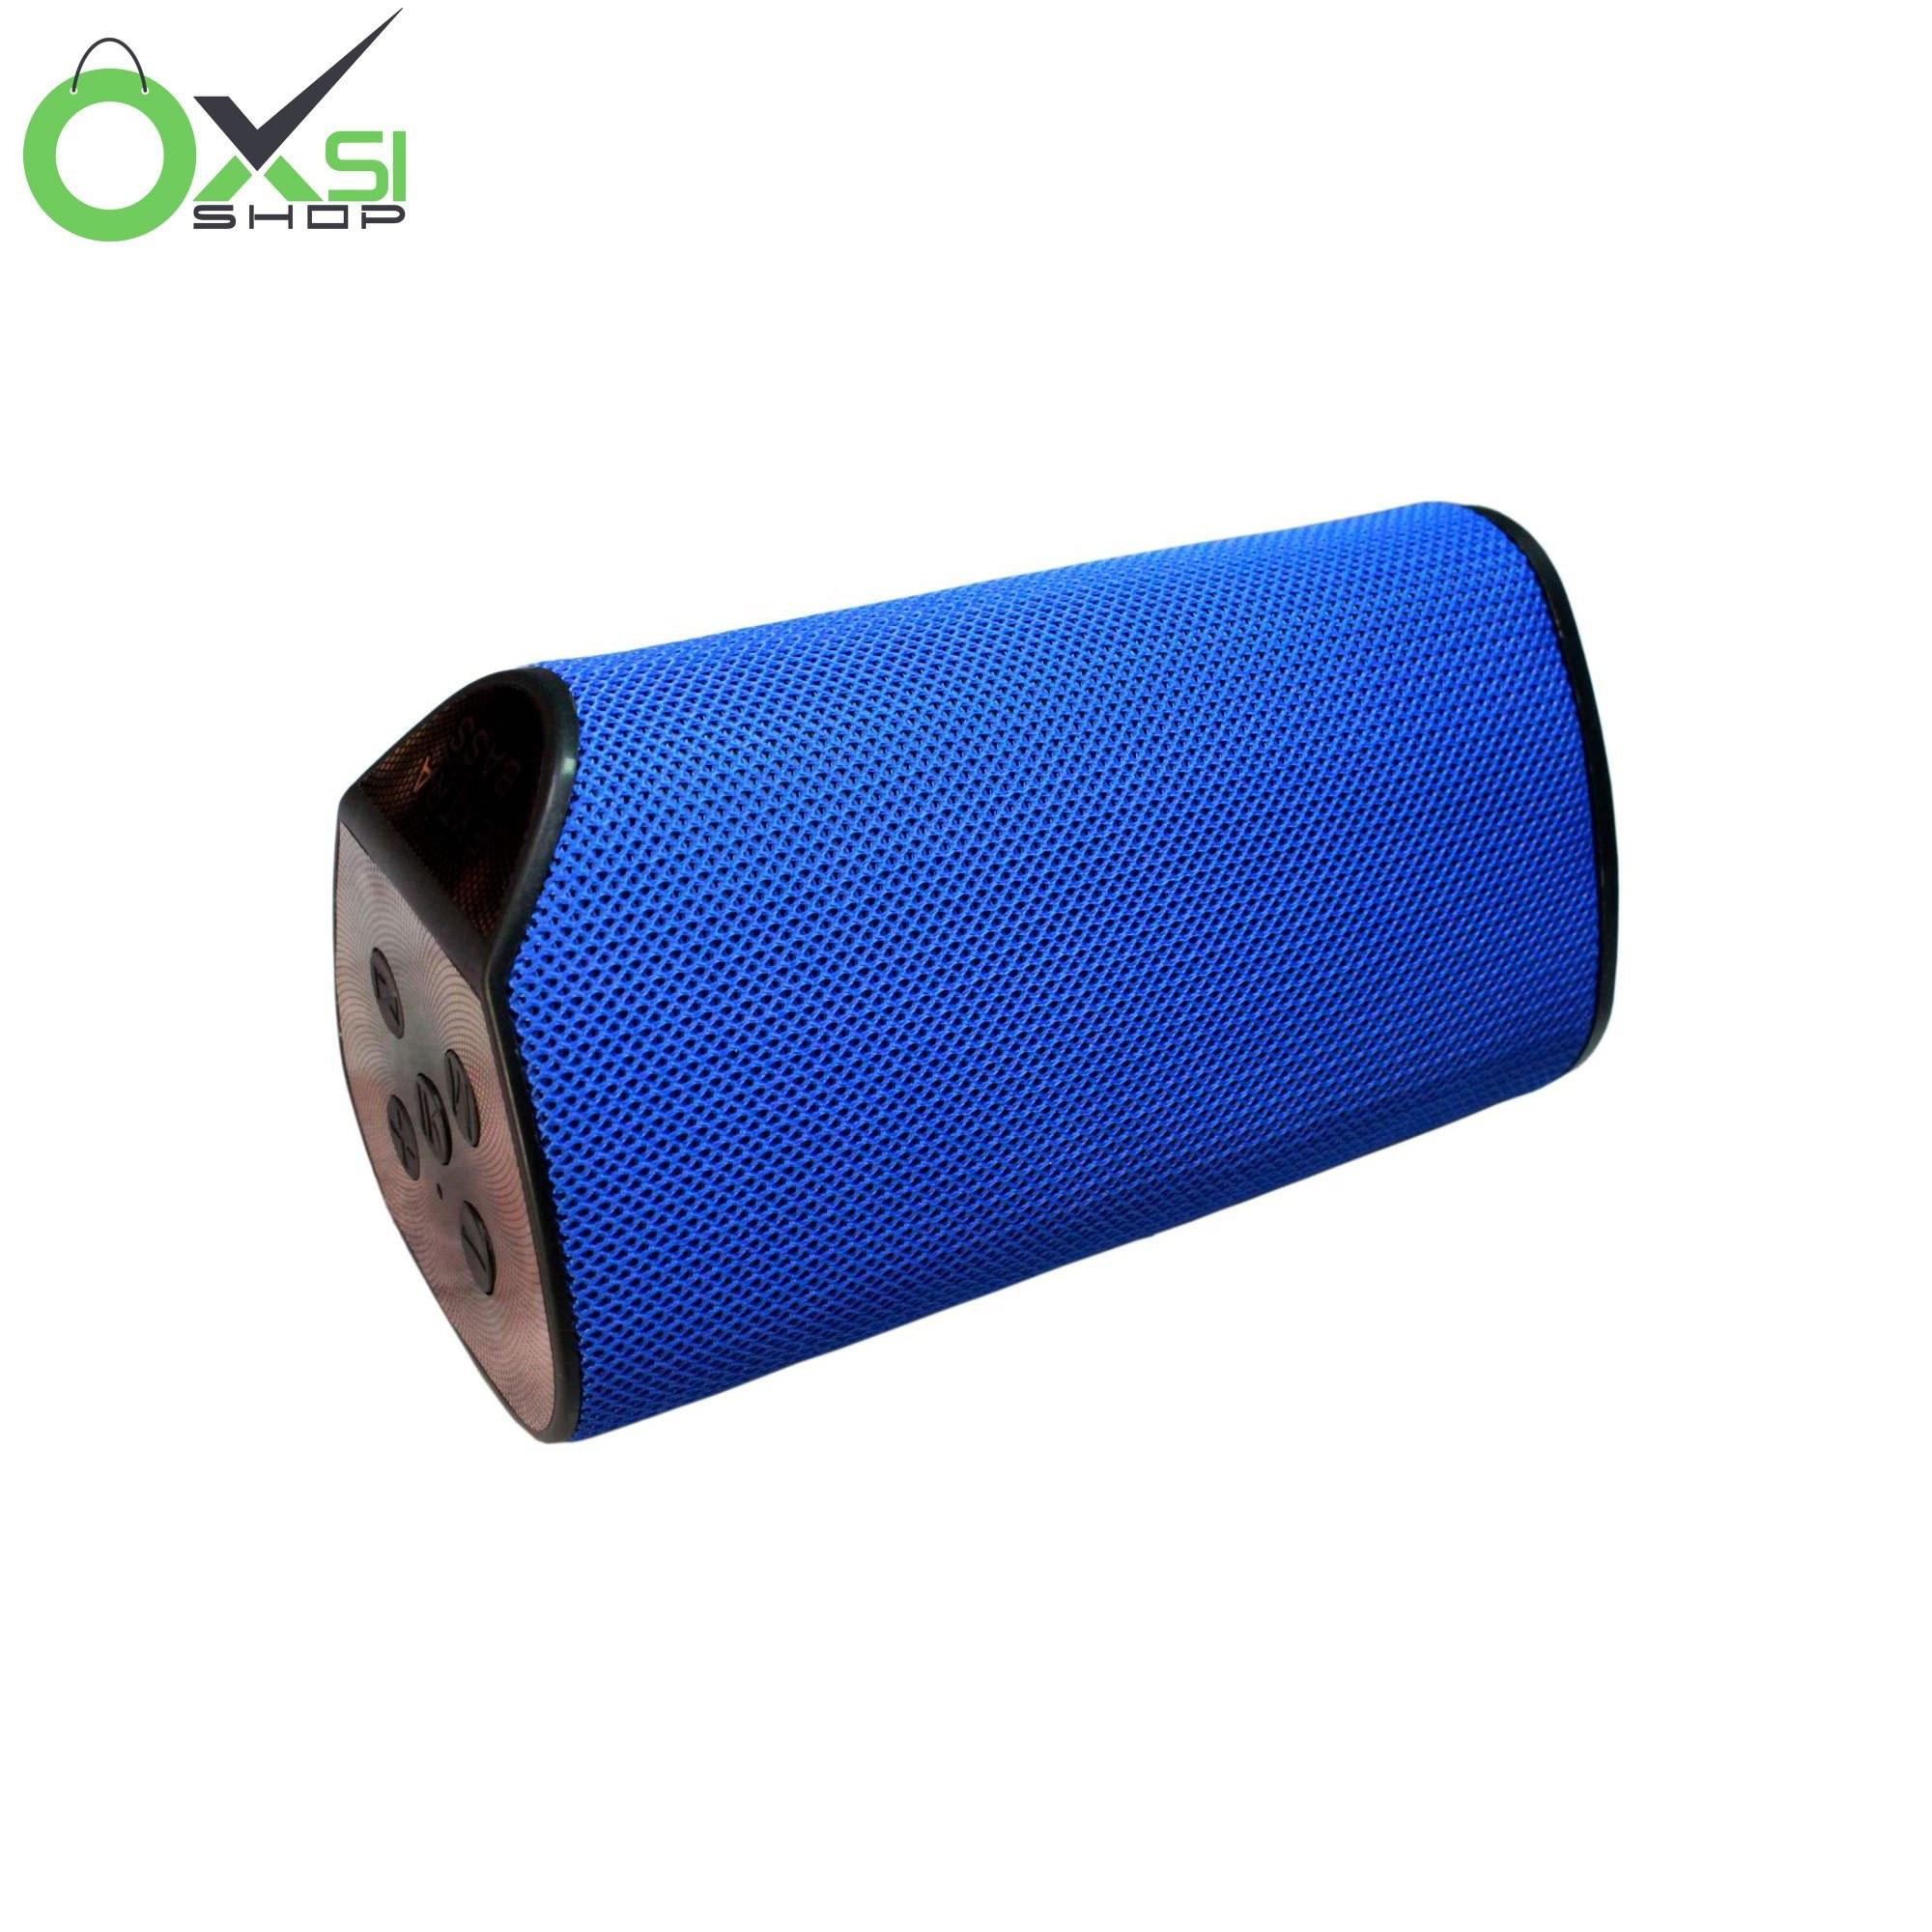 تصویر اسپیکر بلوتوثی قابل حمل مدل TG-111 Portable Bluetooth speaker, model TG-111